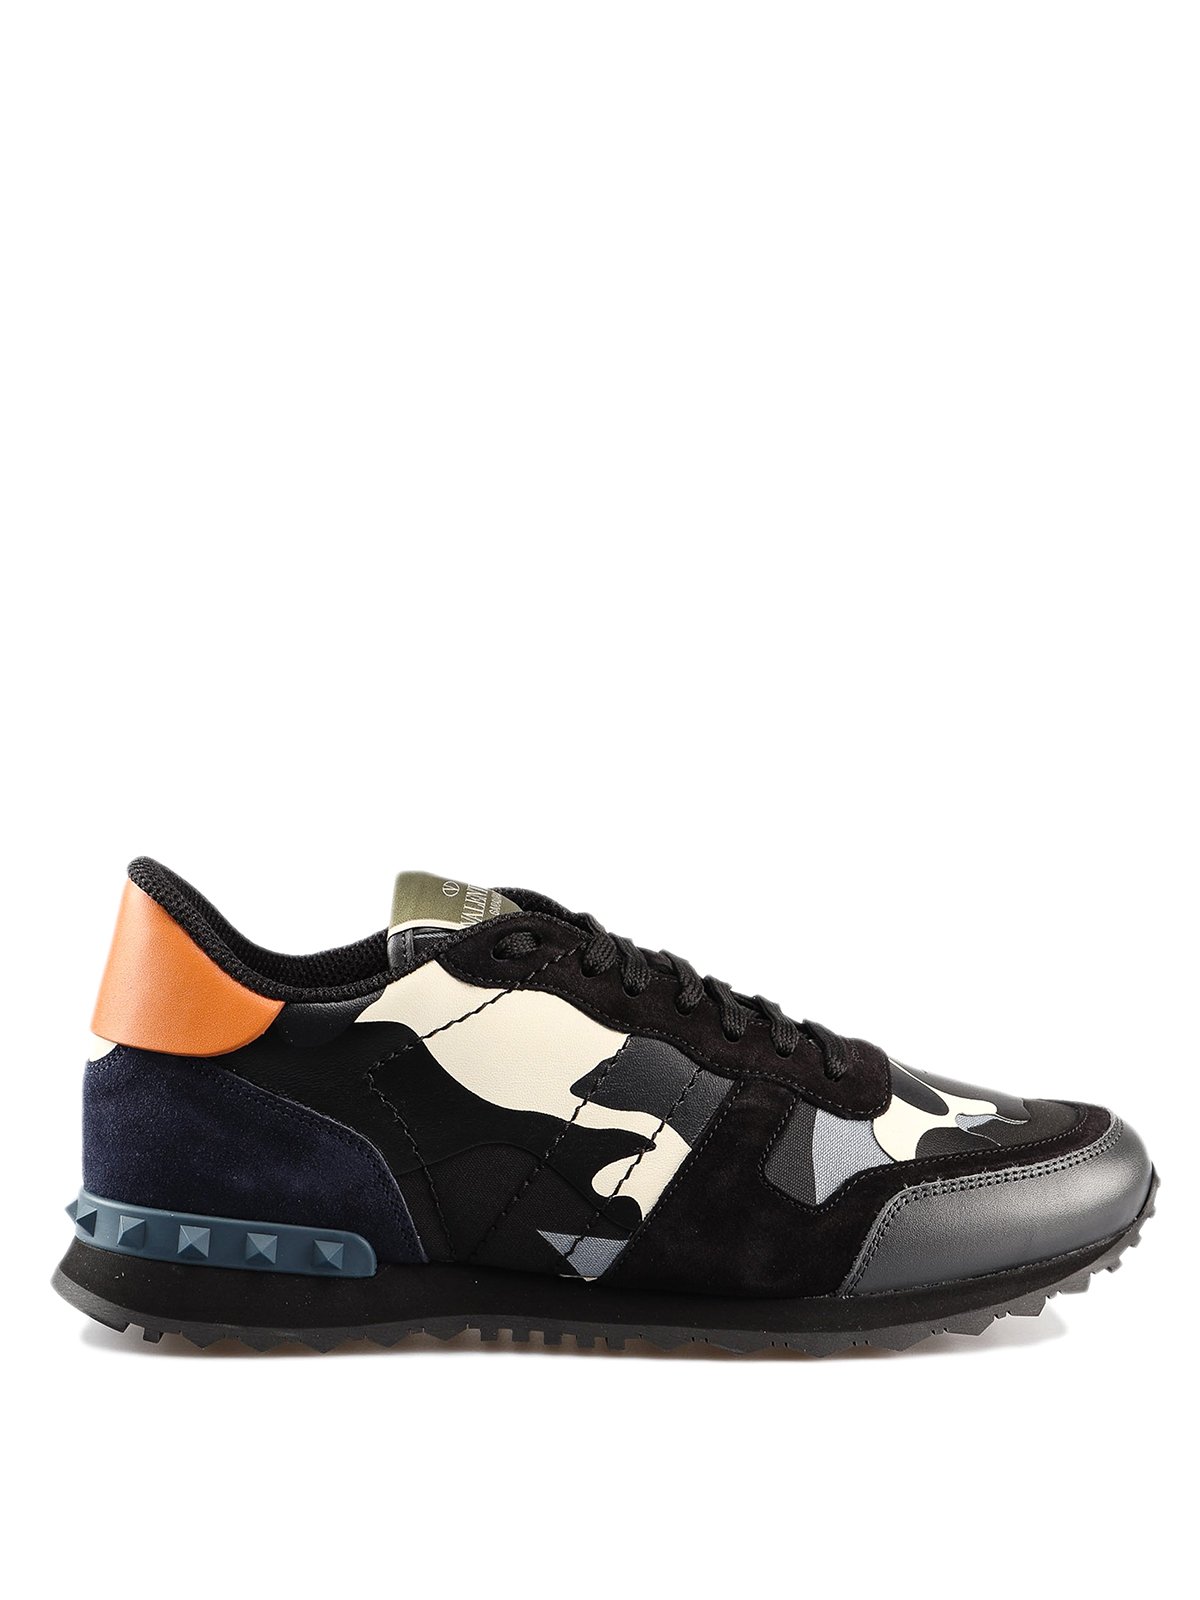 8f4123fd3b8b5 VALENTINO GARAVANI: trainers - Rockrunner Camouflage multicolour sneakers